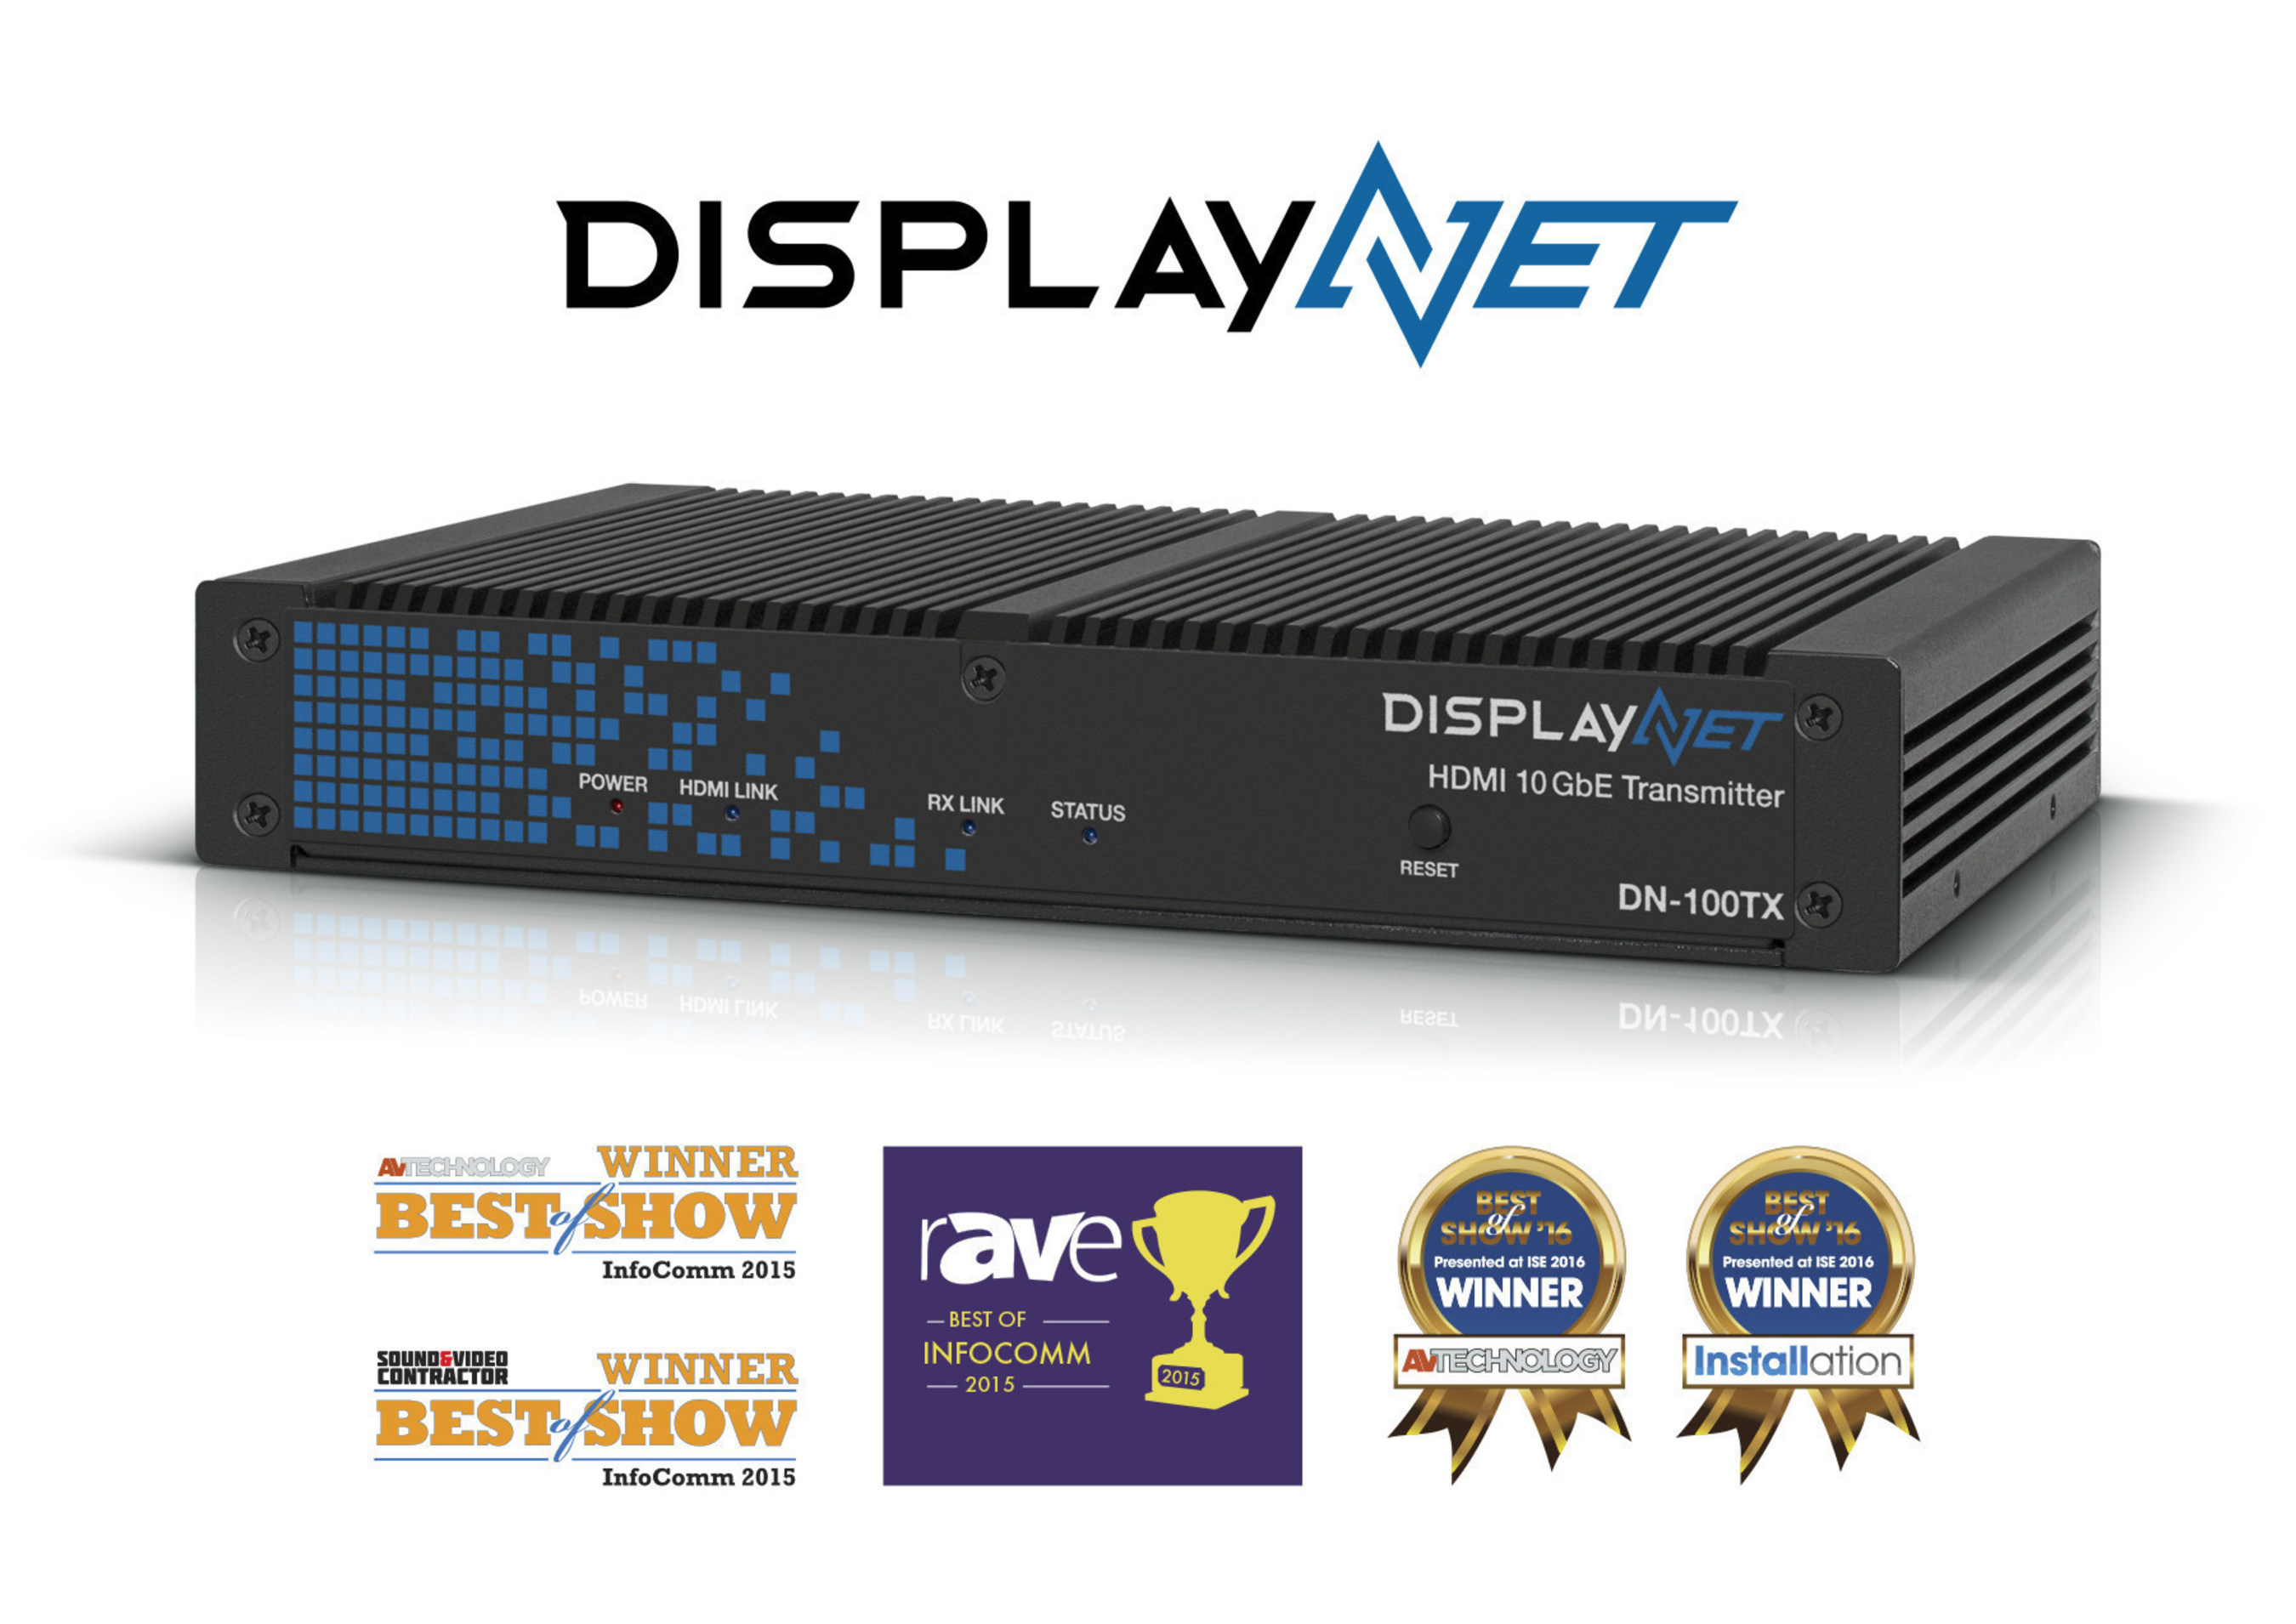 DVIGear's DisplayNet™ Wins Fifth Best of Show Award